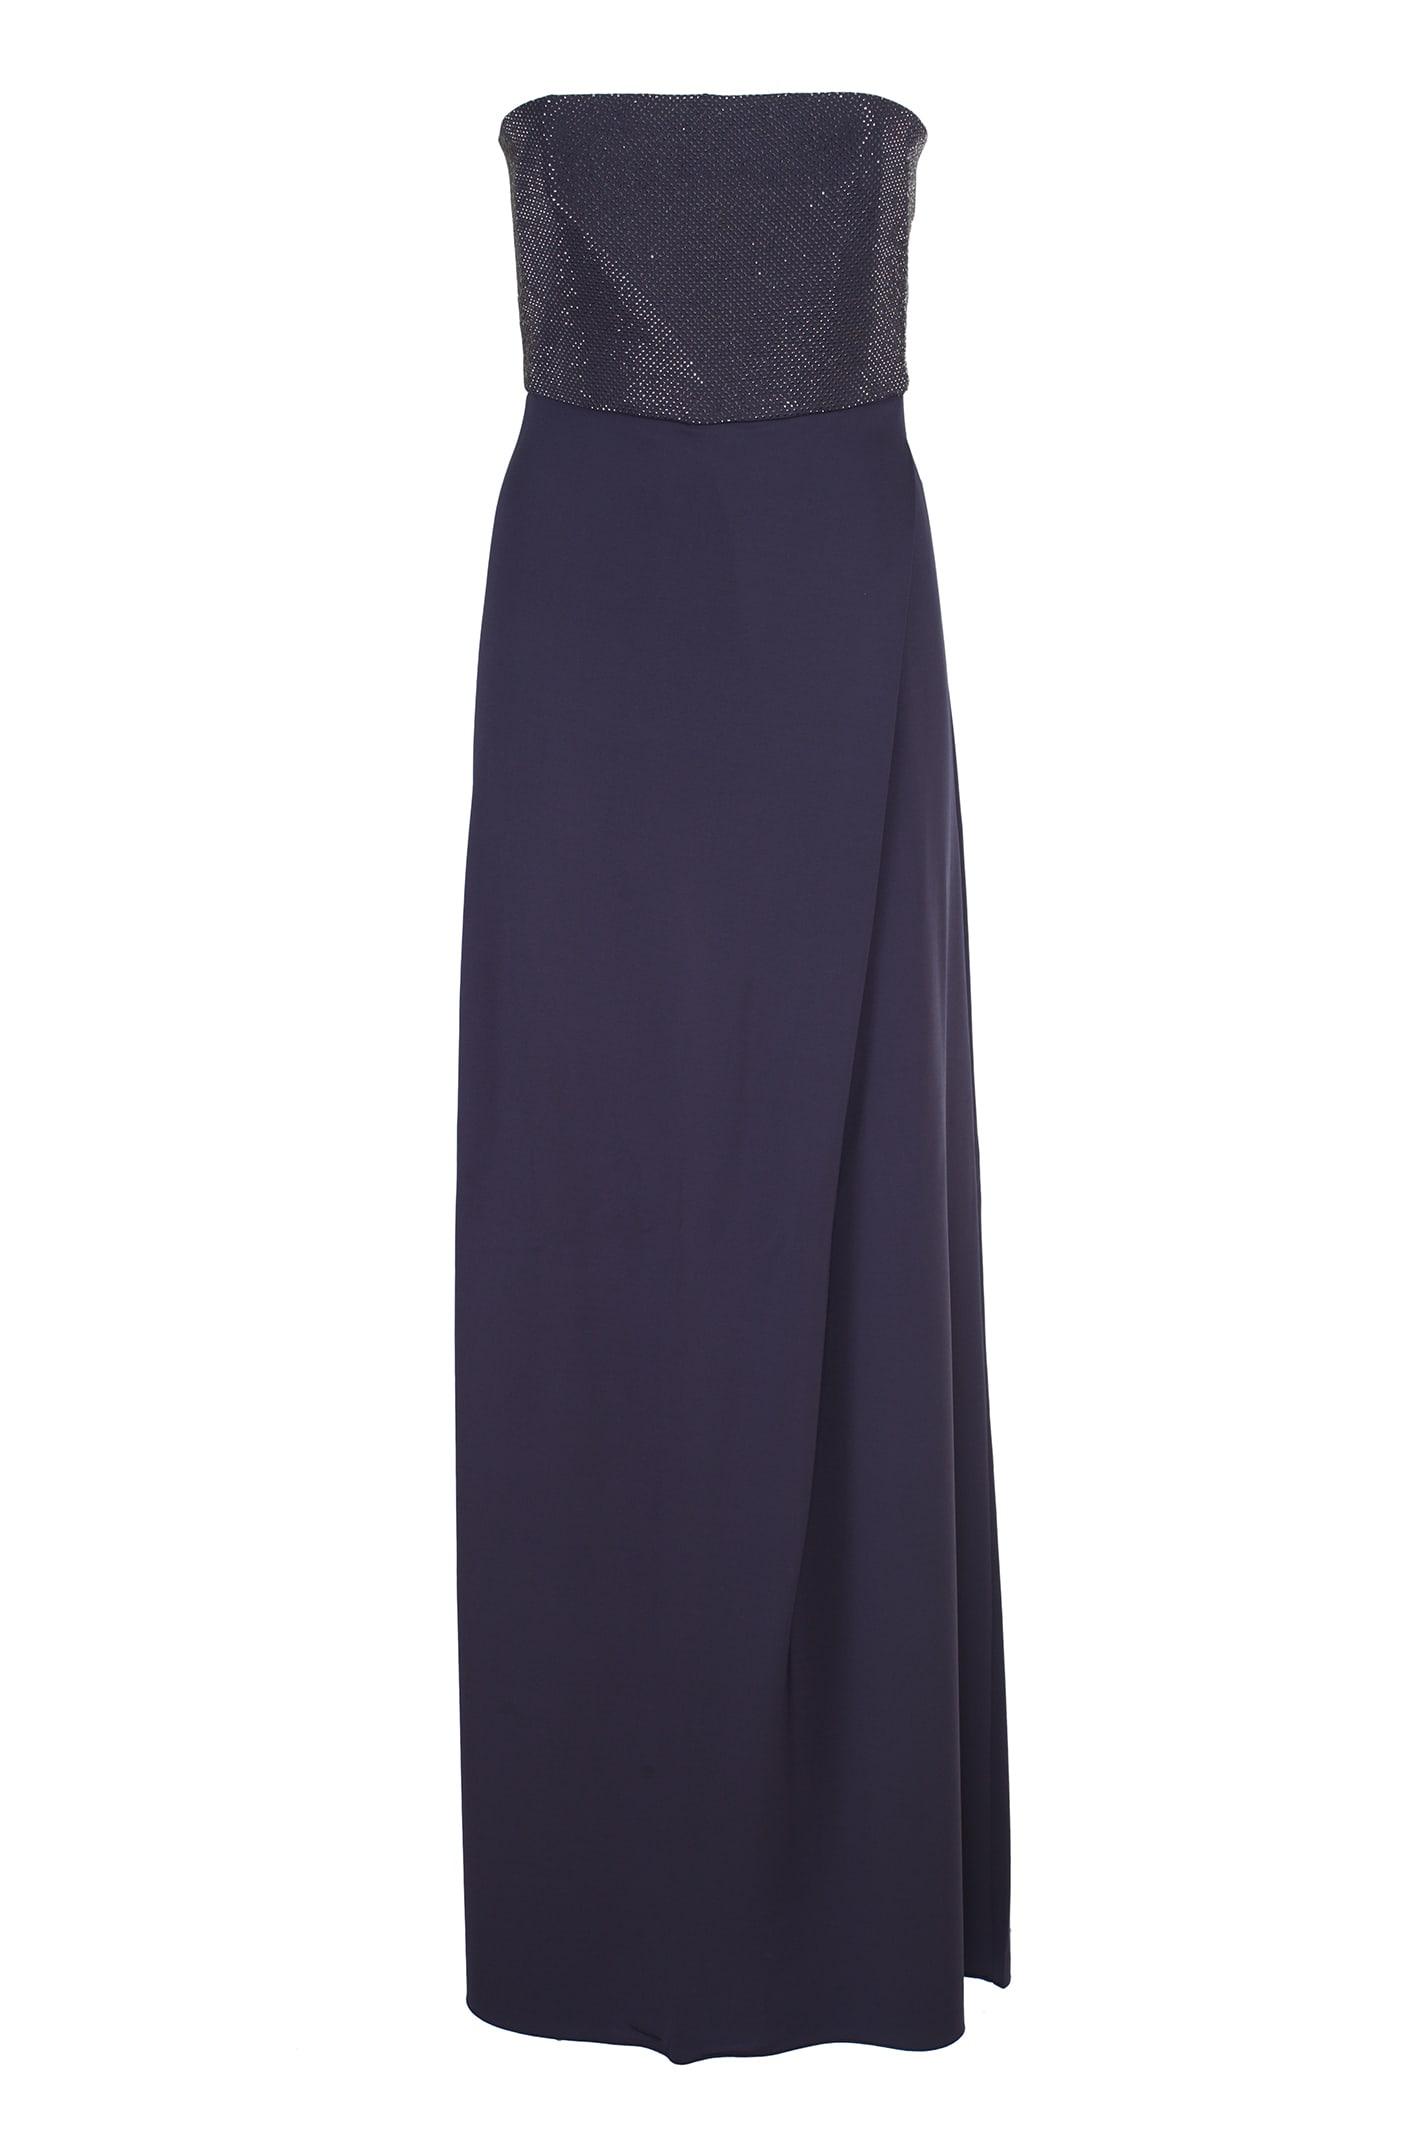 Buy Emporio Armani Long Crepe Dress online, shop Emporio Armani with free shipping